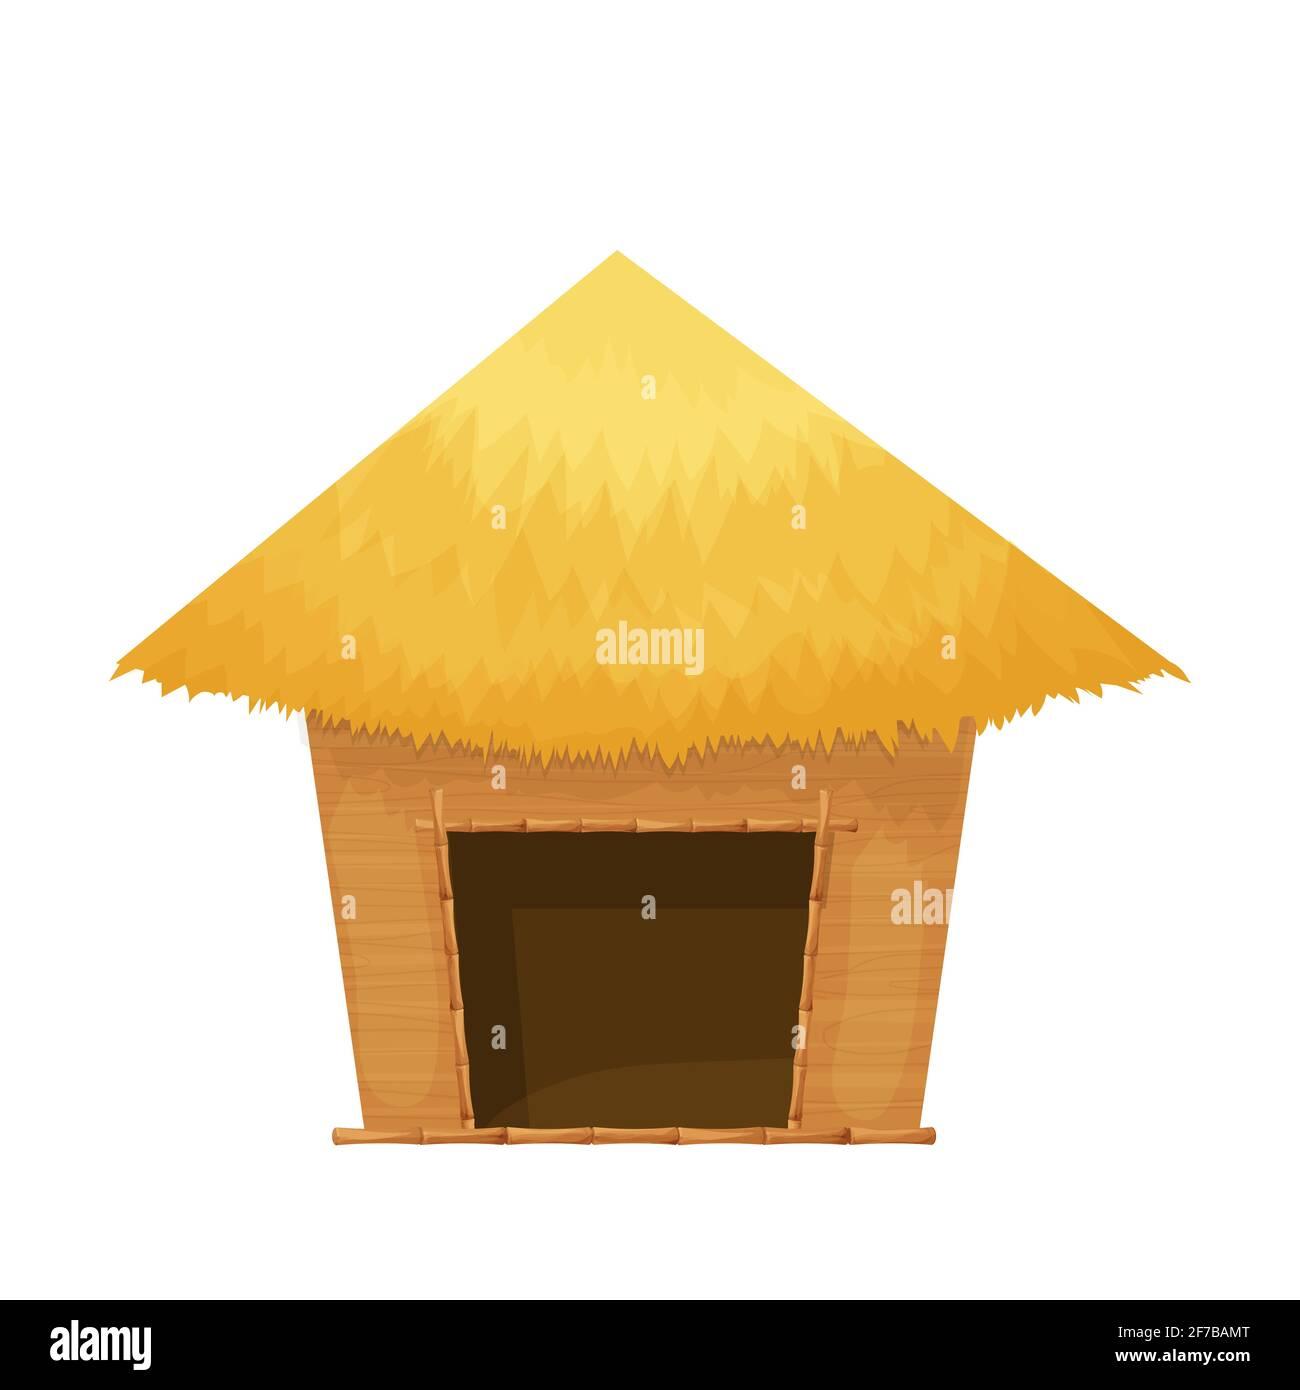 Cabaña de playa o bungalow con techo de paja, madera en estilo de dibujos animados aislados sobre fondo blanco. Cabaña de bambú, pequeña casa objeto exótico. Ilustración vectorial Ilustración del Vector